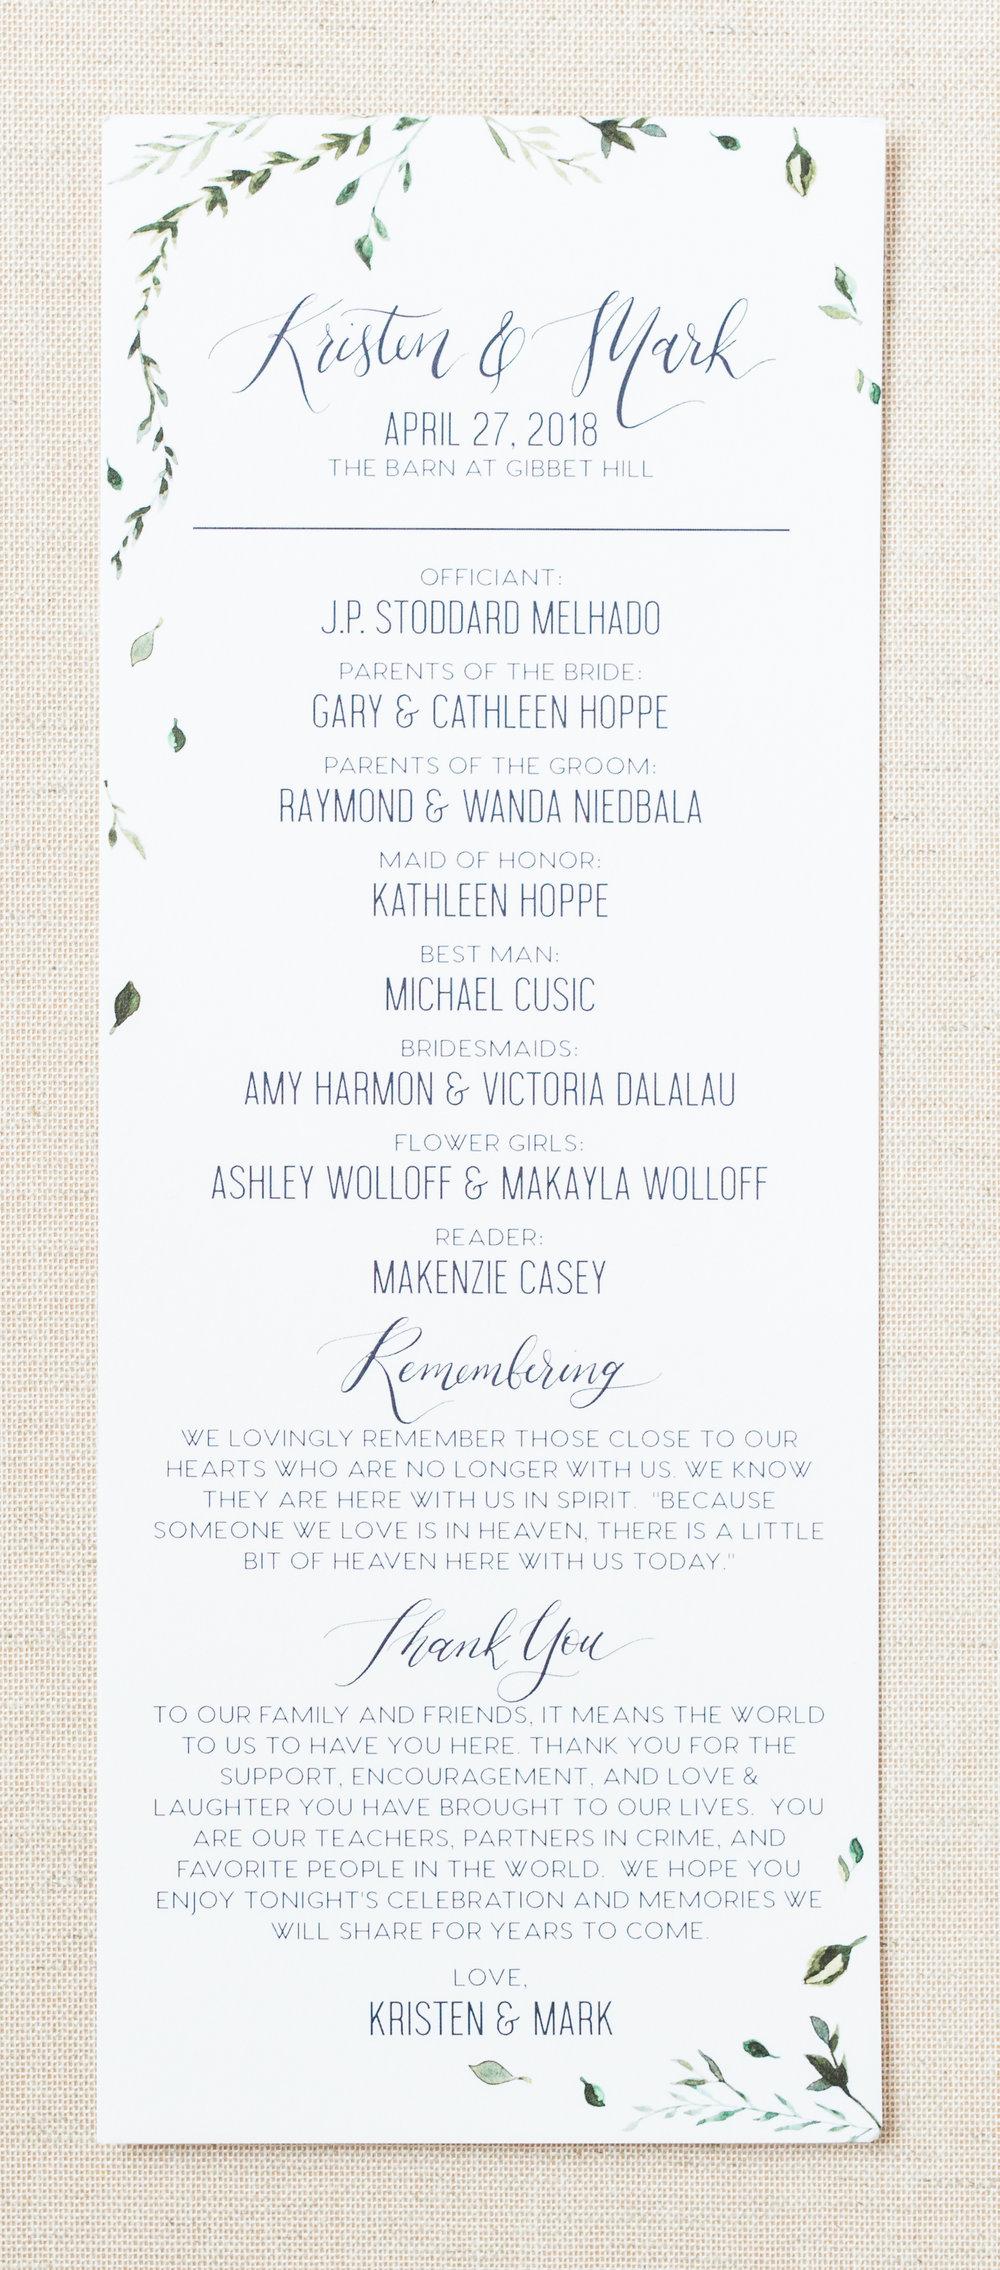 Kristen-Mark-Niedbala-Wedding-25c.jpg